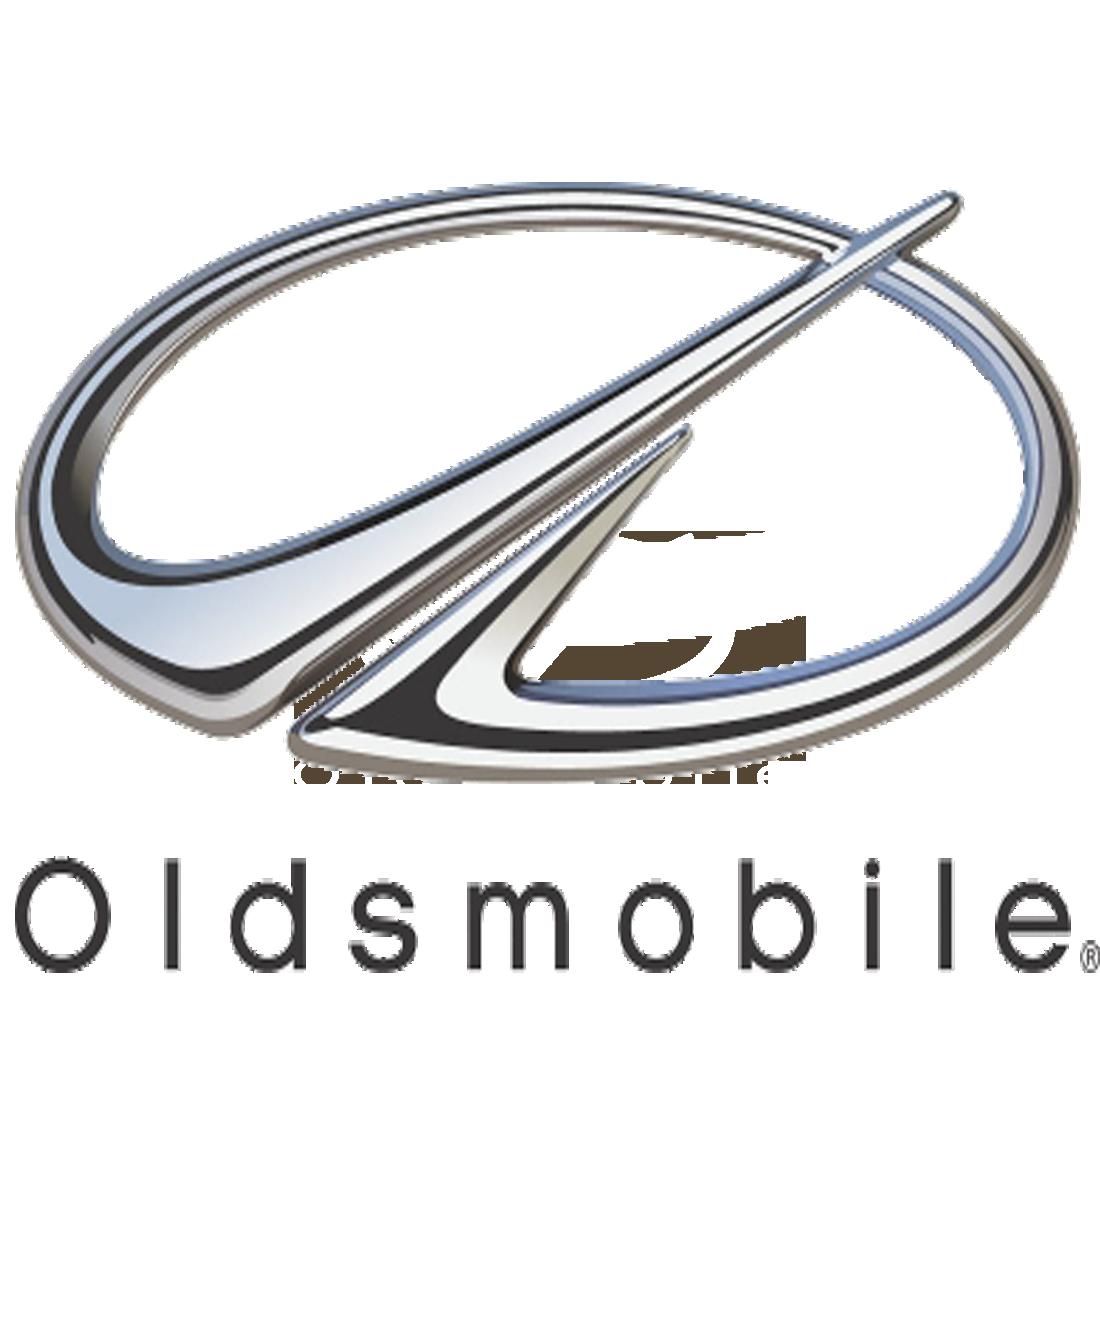 Oldsmobile Transmission shift cable repair kit